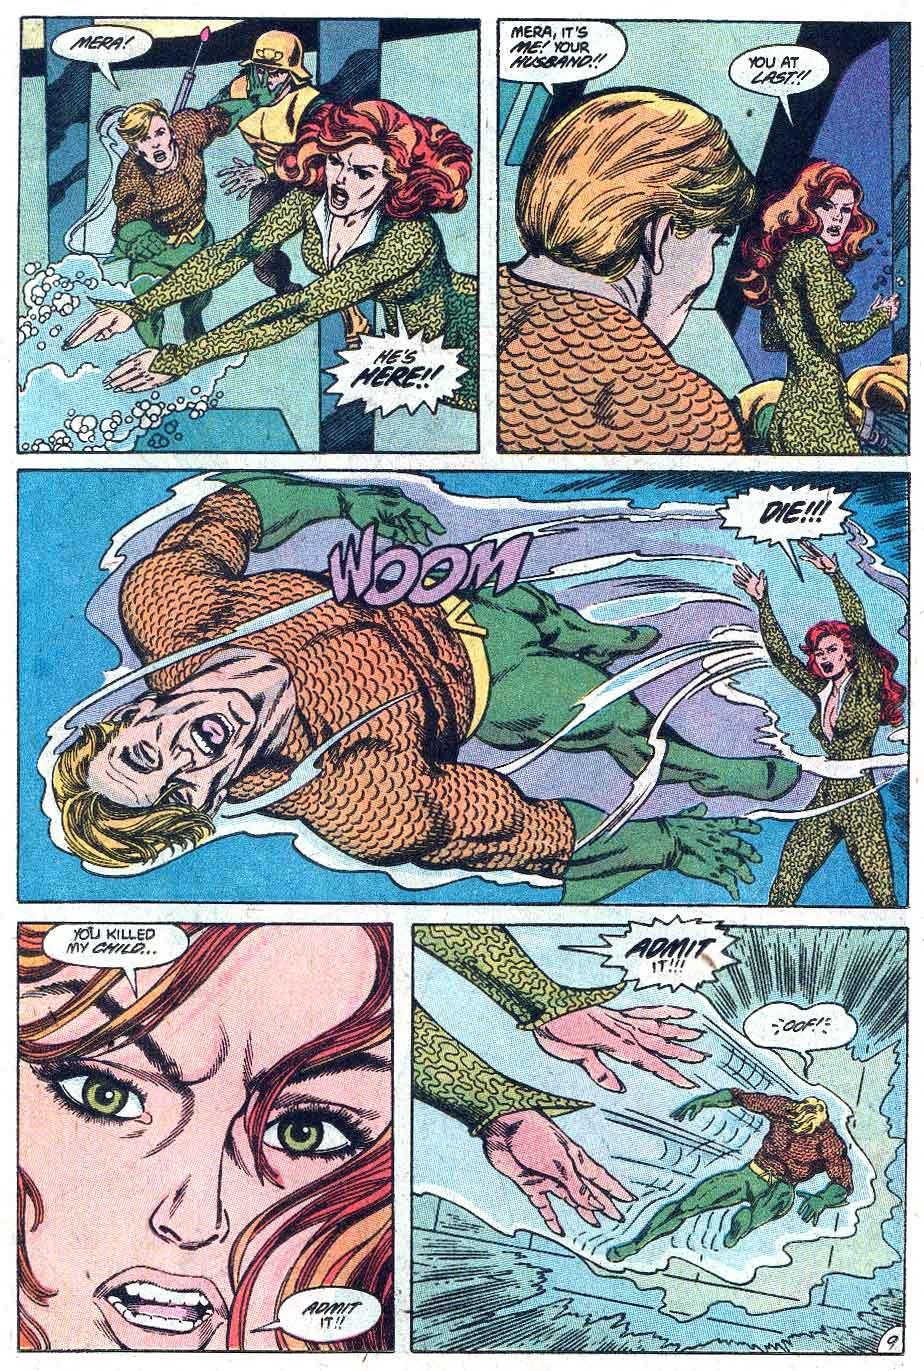 Read online Aquaman (1989) comic -  Issue #3 - 10